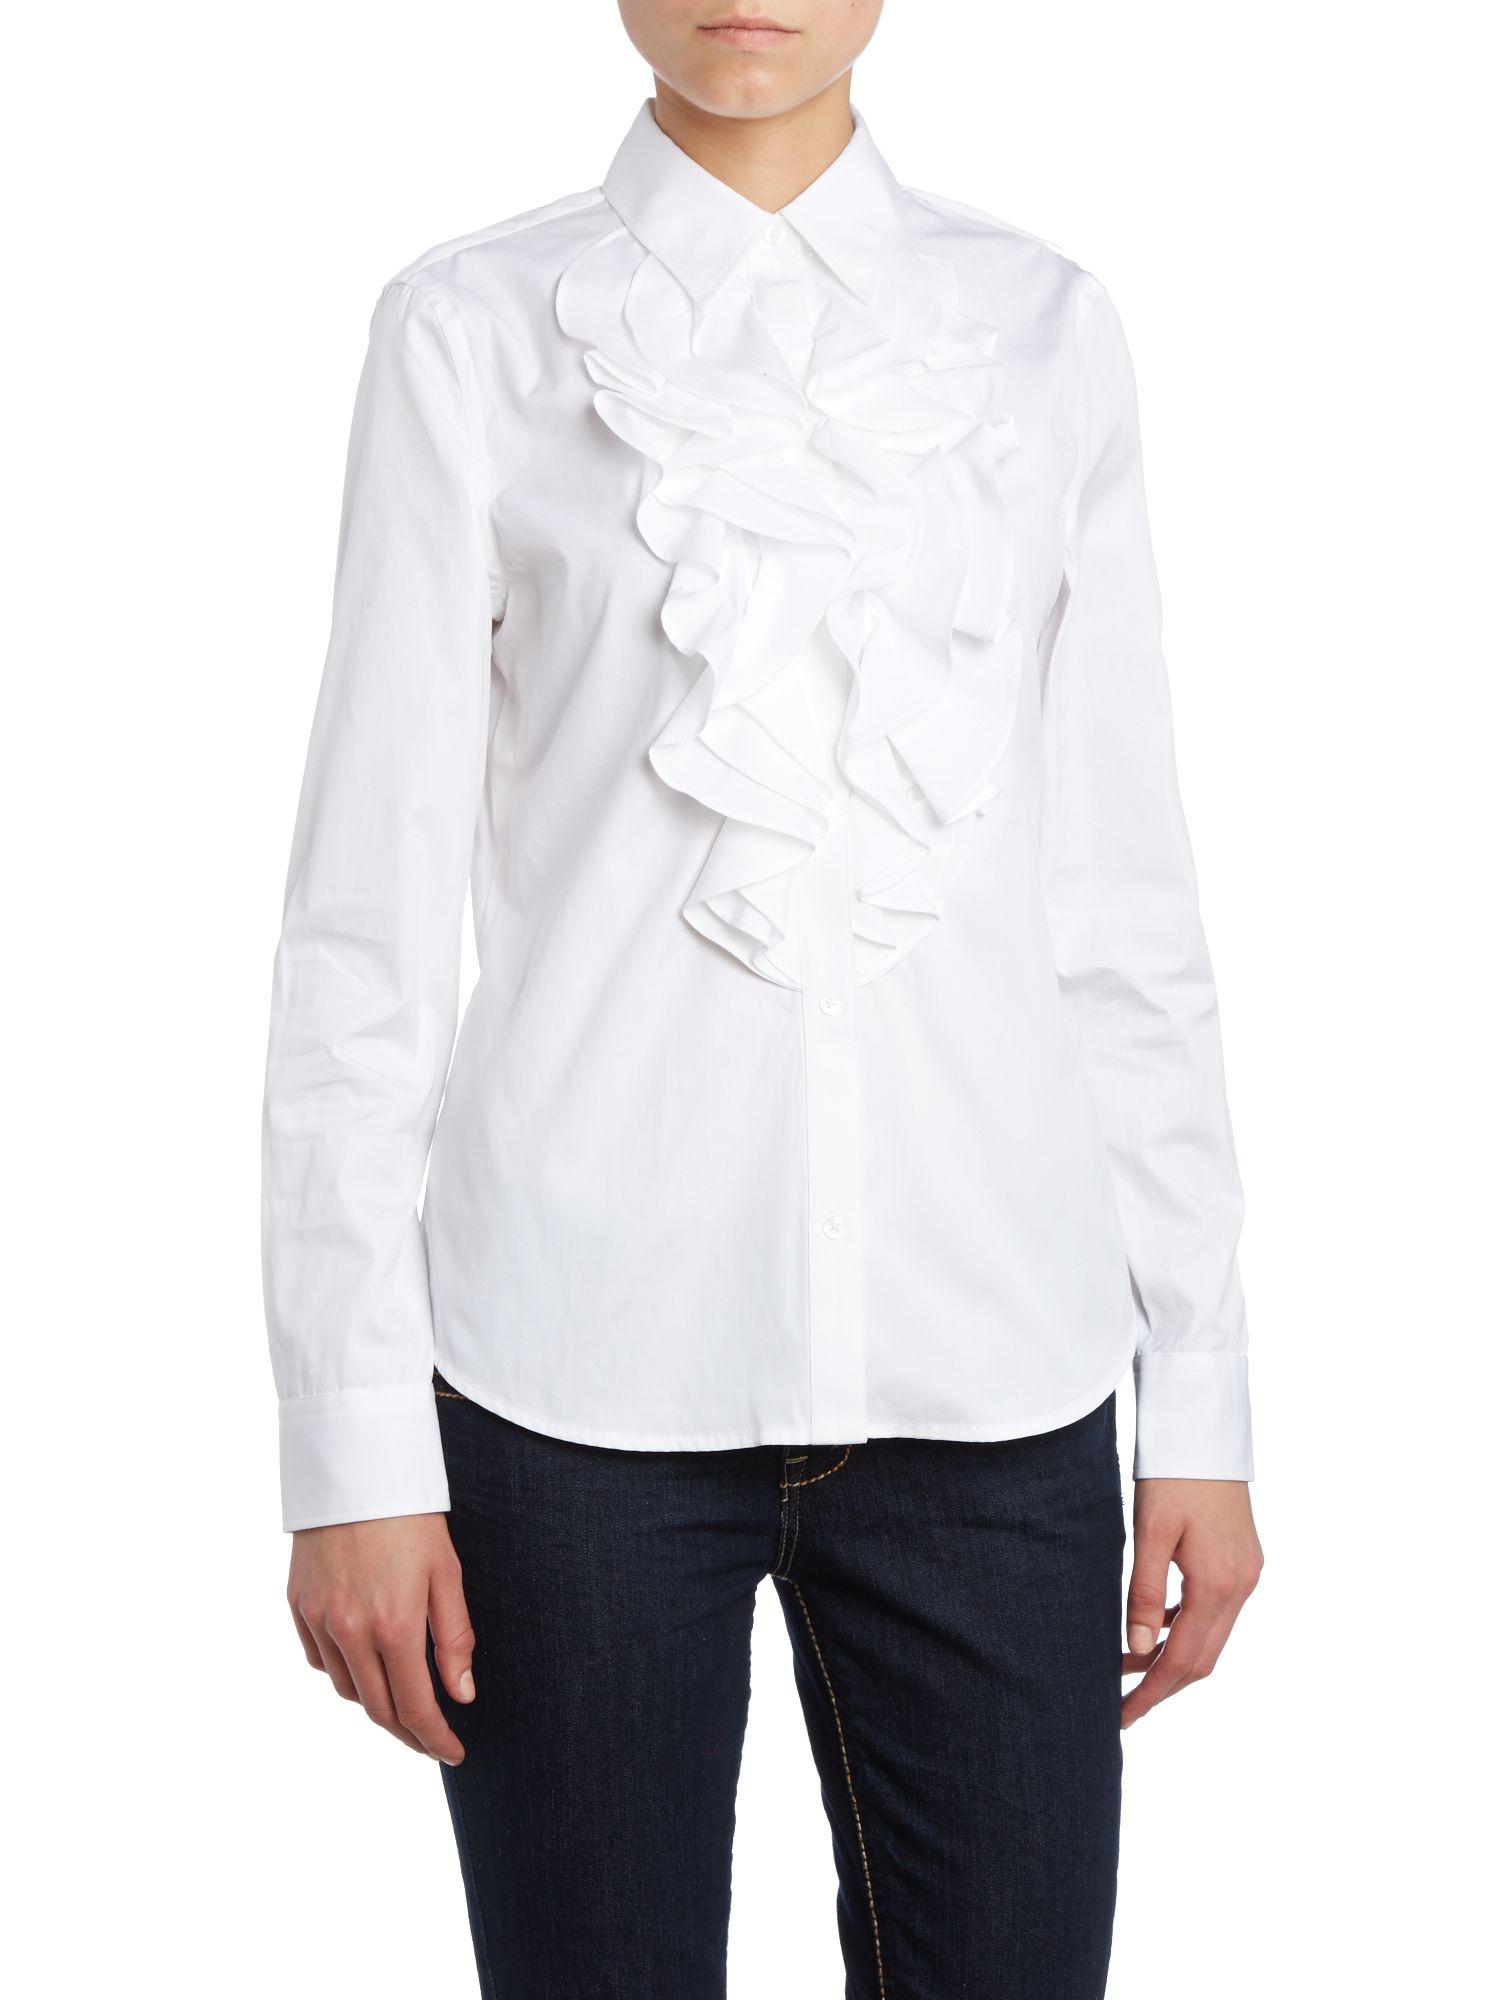 MUVEIL Ruffle-trimmed Cotton-jersey T-shirt in White - Lyst |Ruffle Shirt